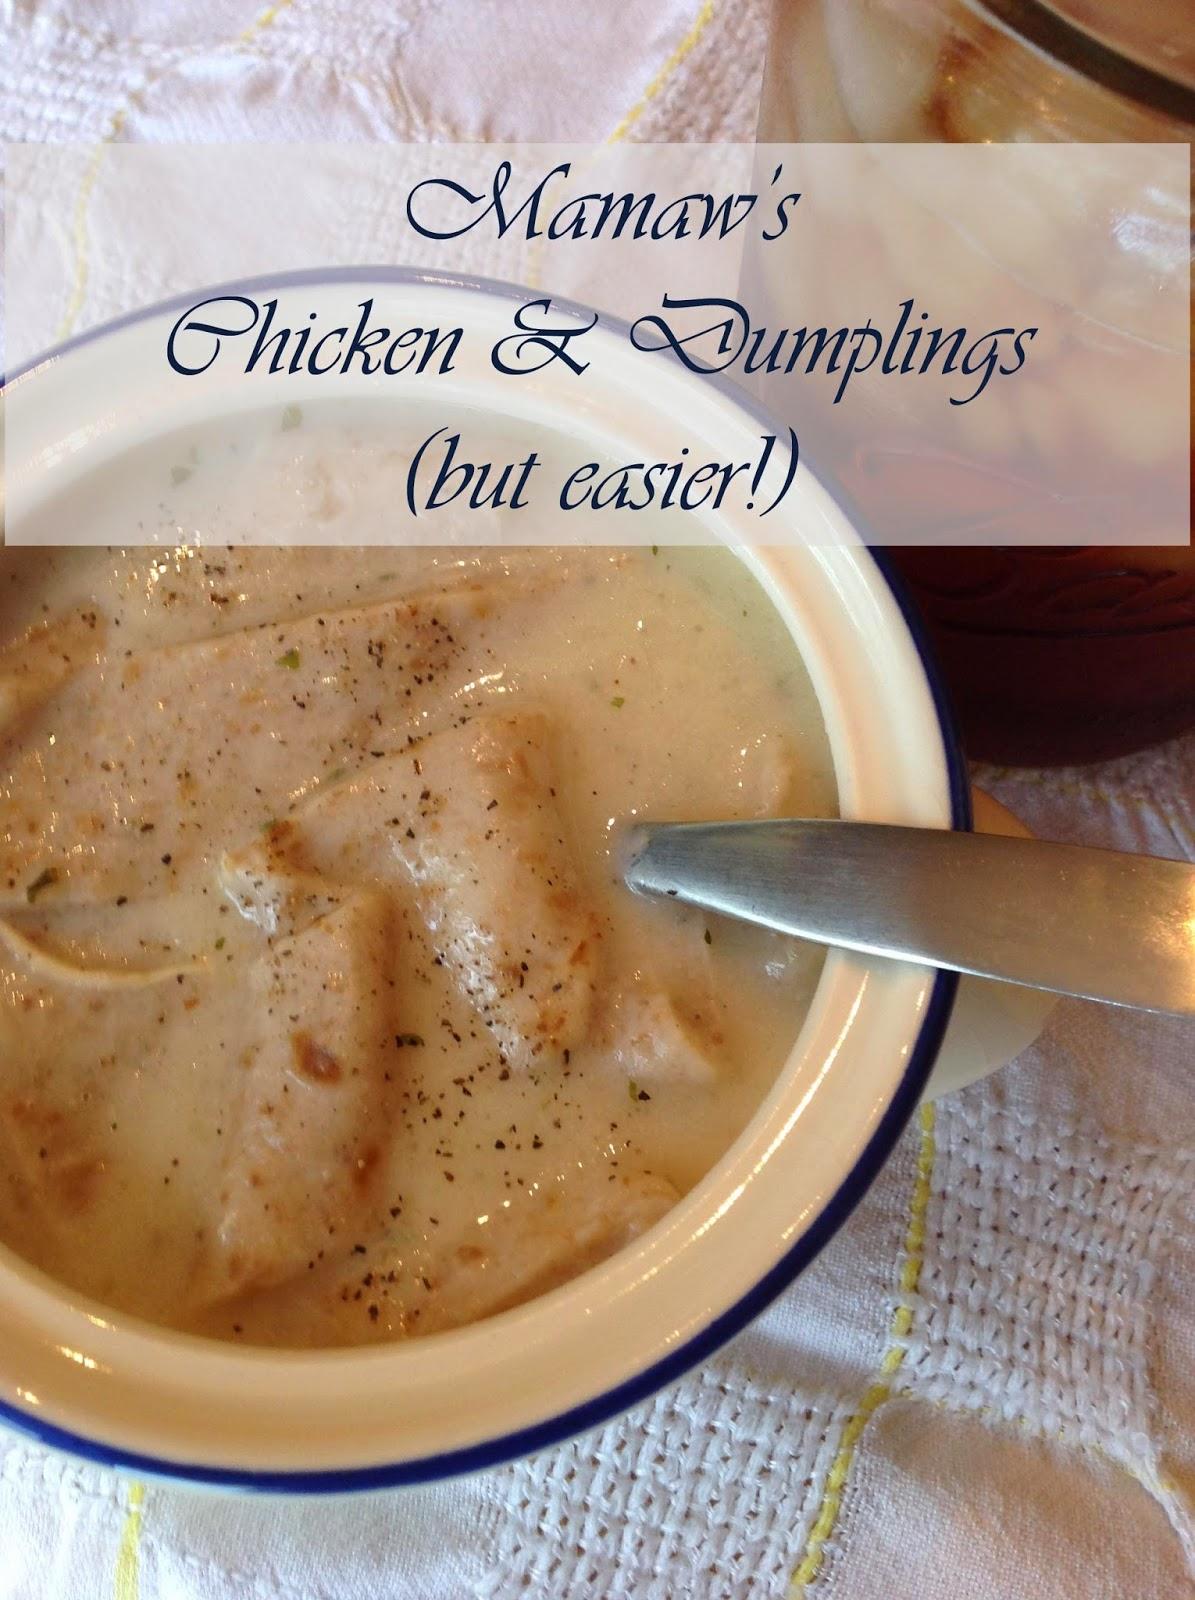 Amazing chicken and dumplings recipe